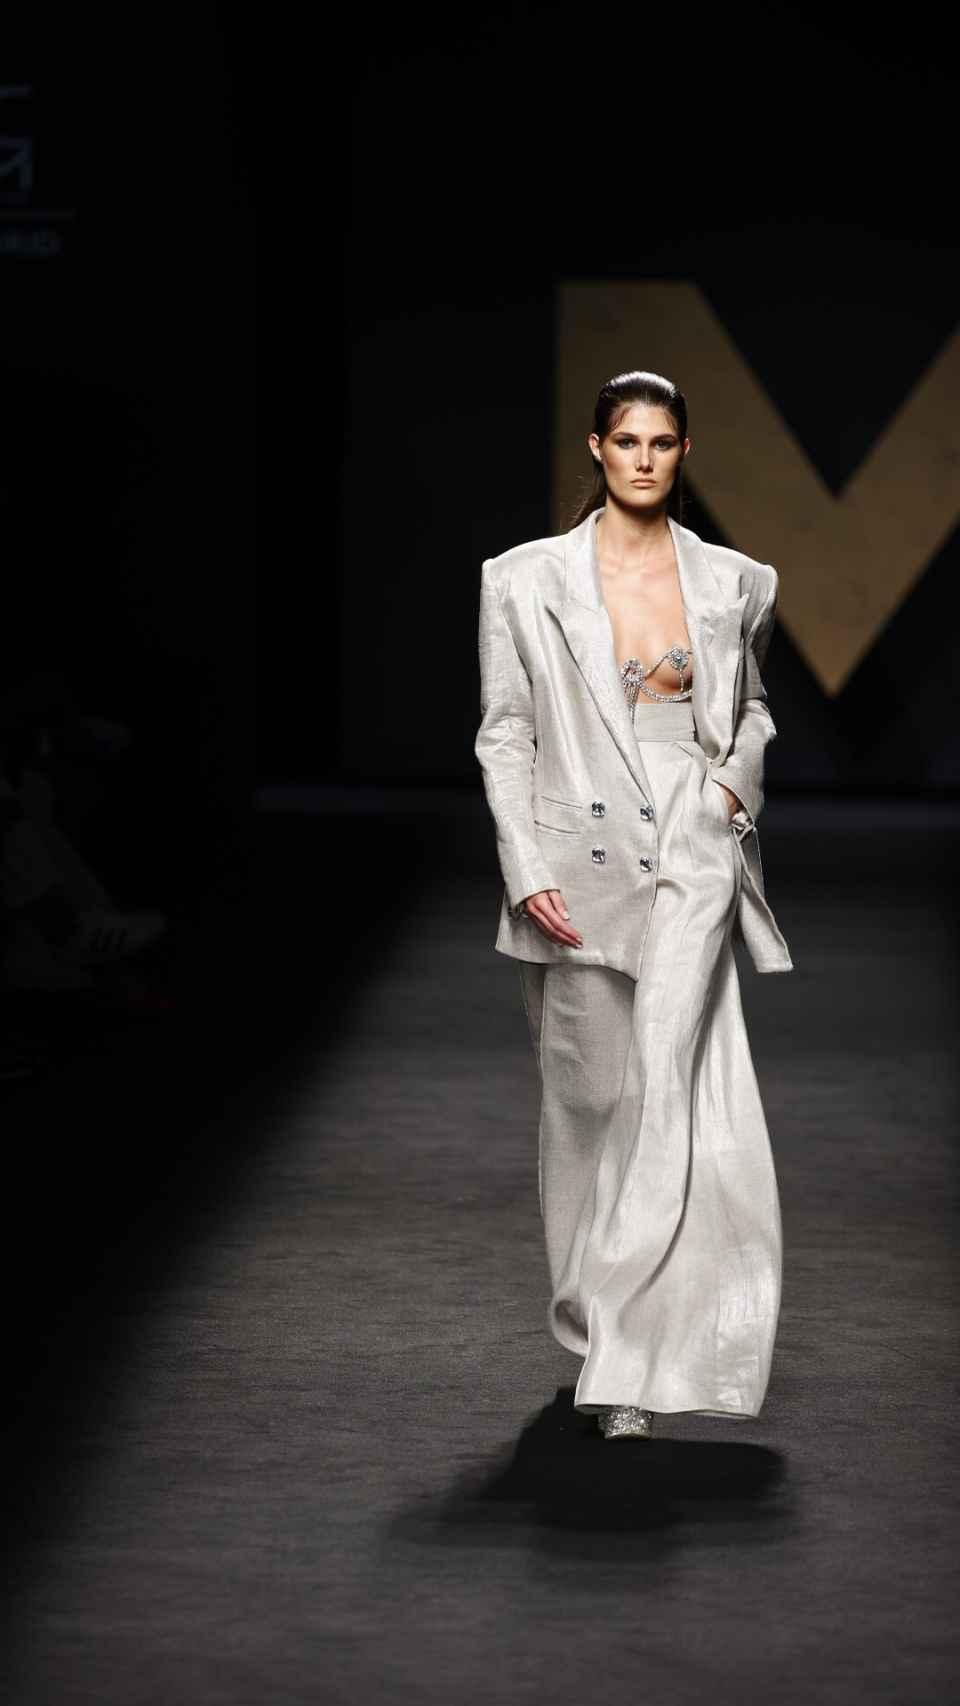 Modelo en el desfile de Malne en Mercedes-Benz Fashion Week Madrid.